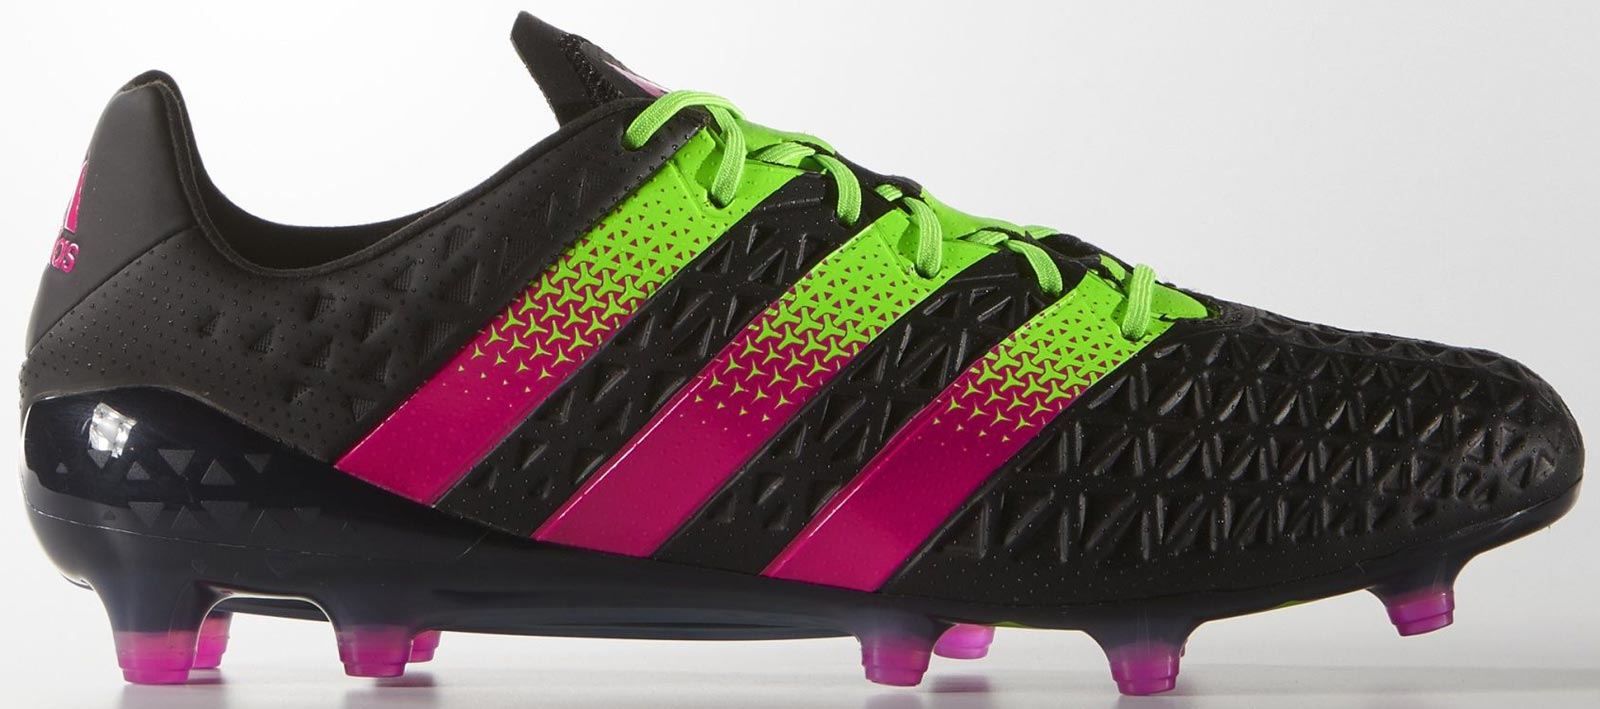 Adidas 16.1 Black